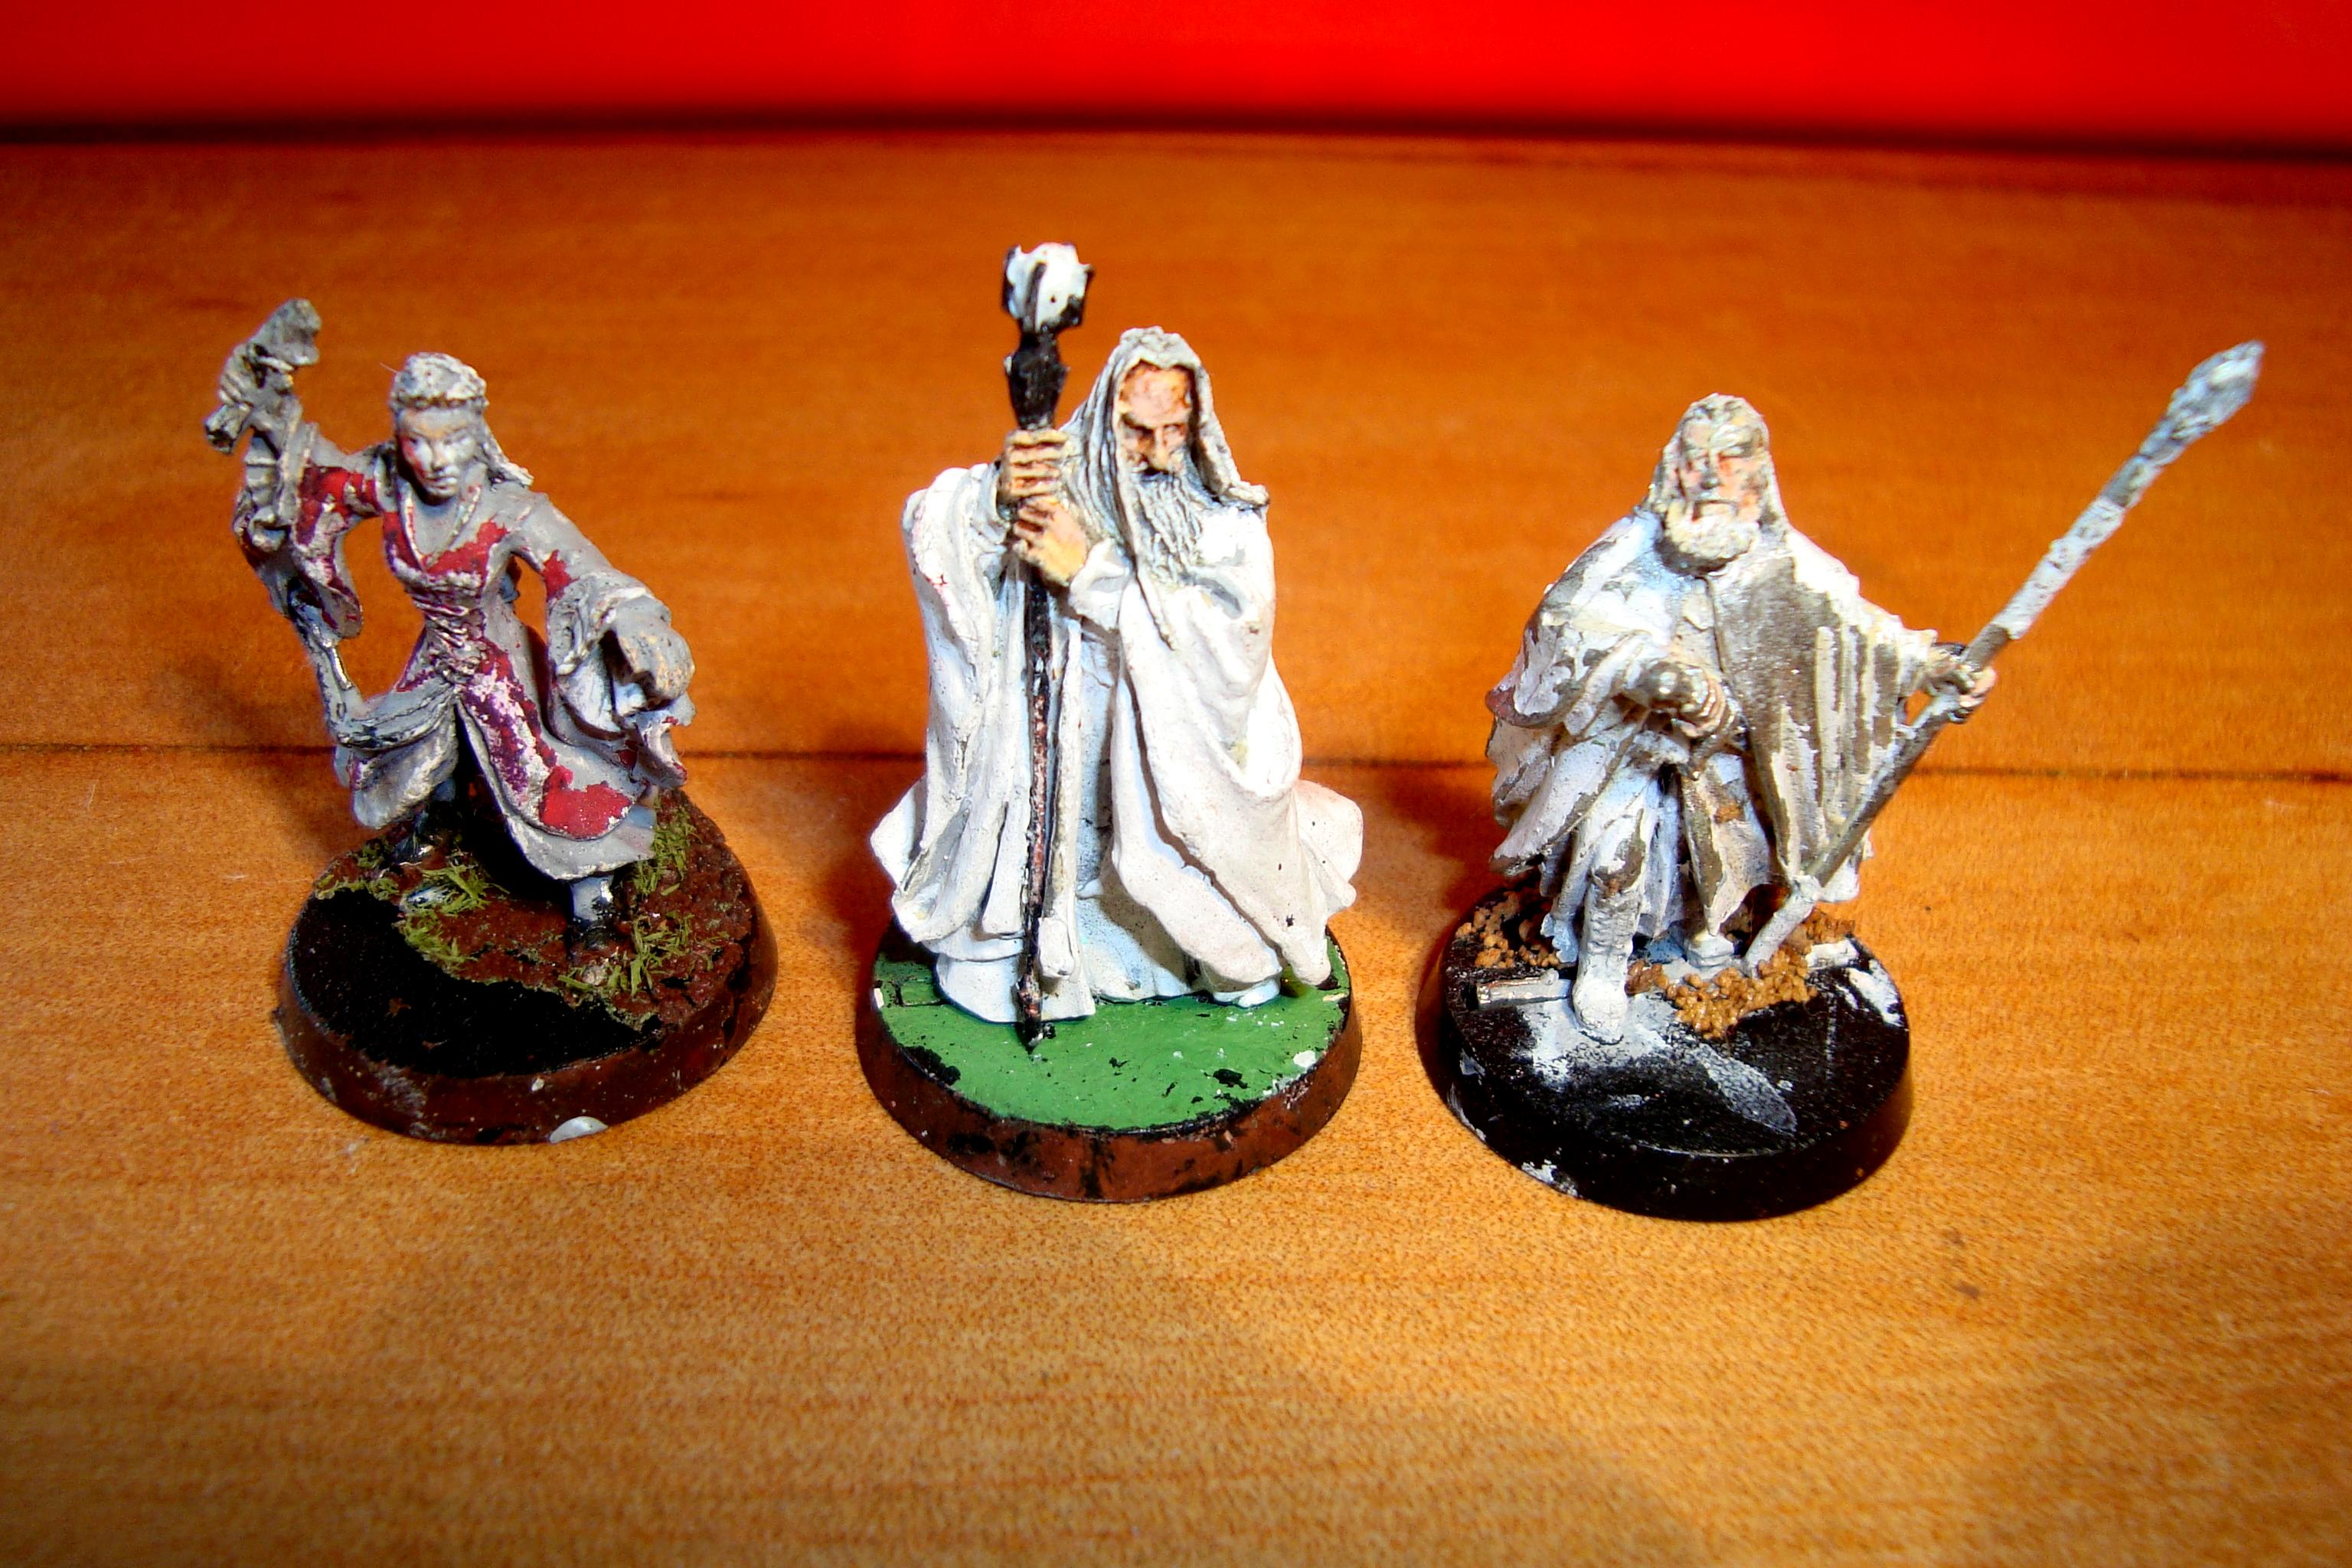 Gandalf, Sauramon and possibly Arwin (broken sword)